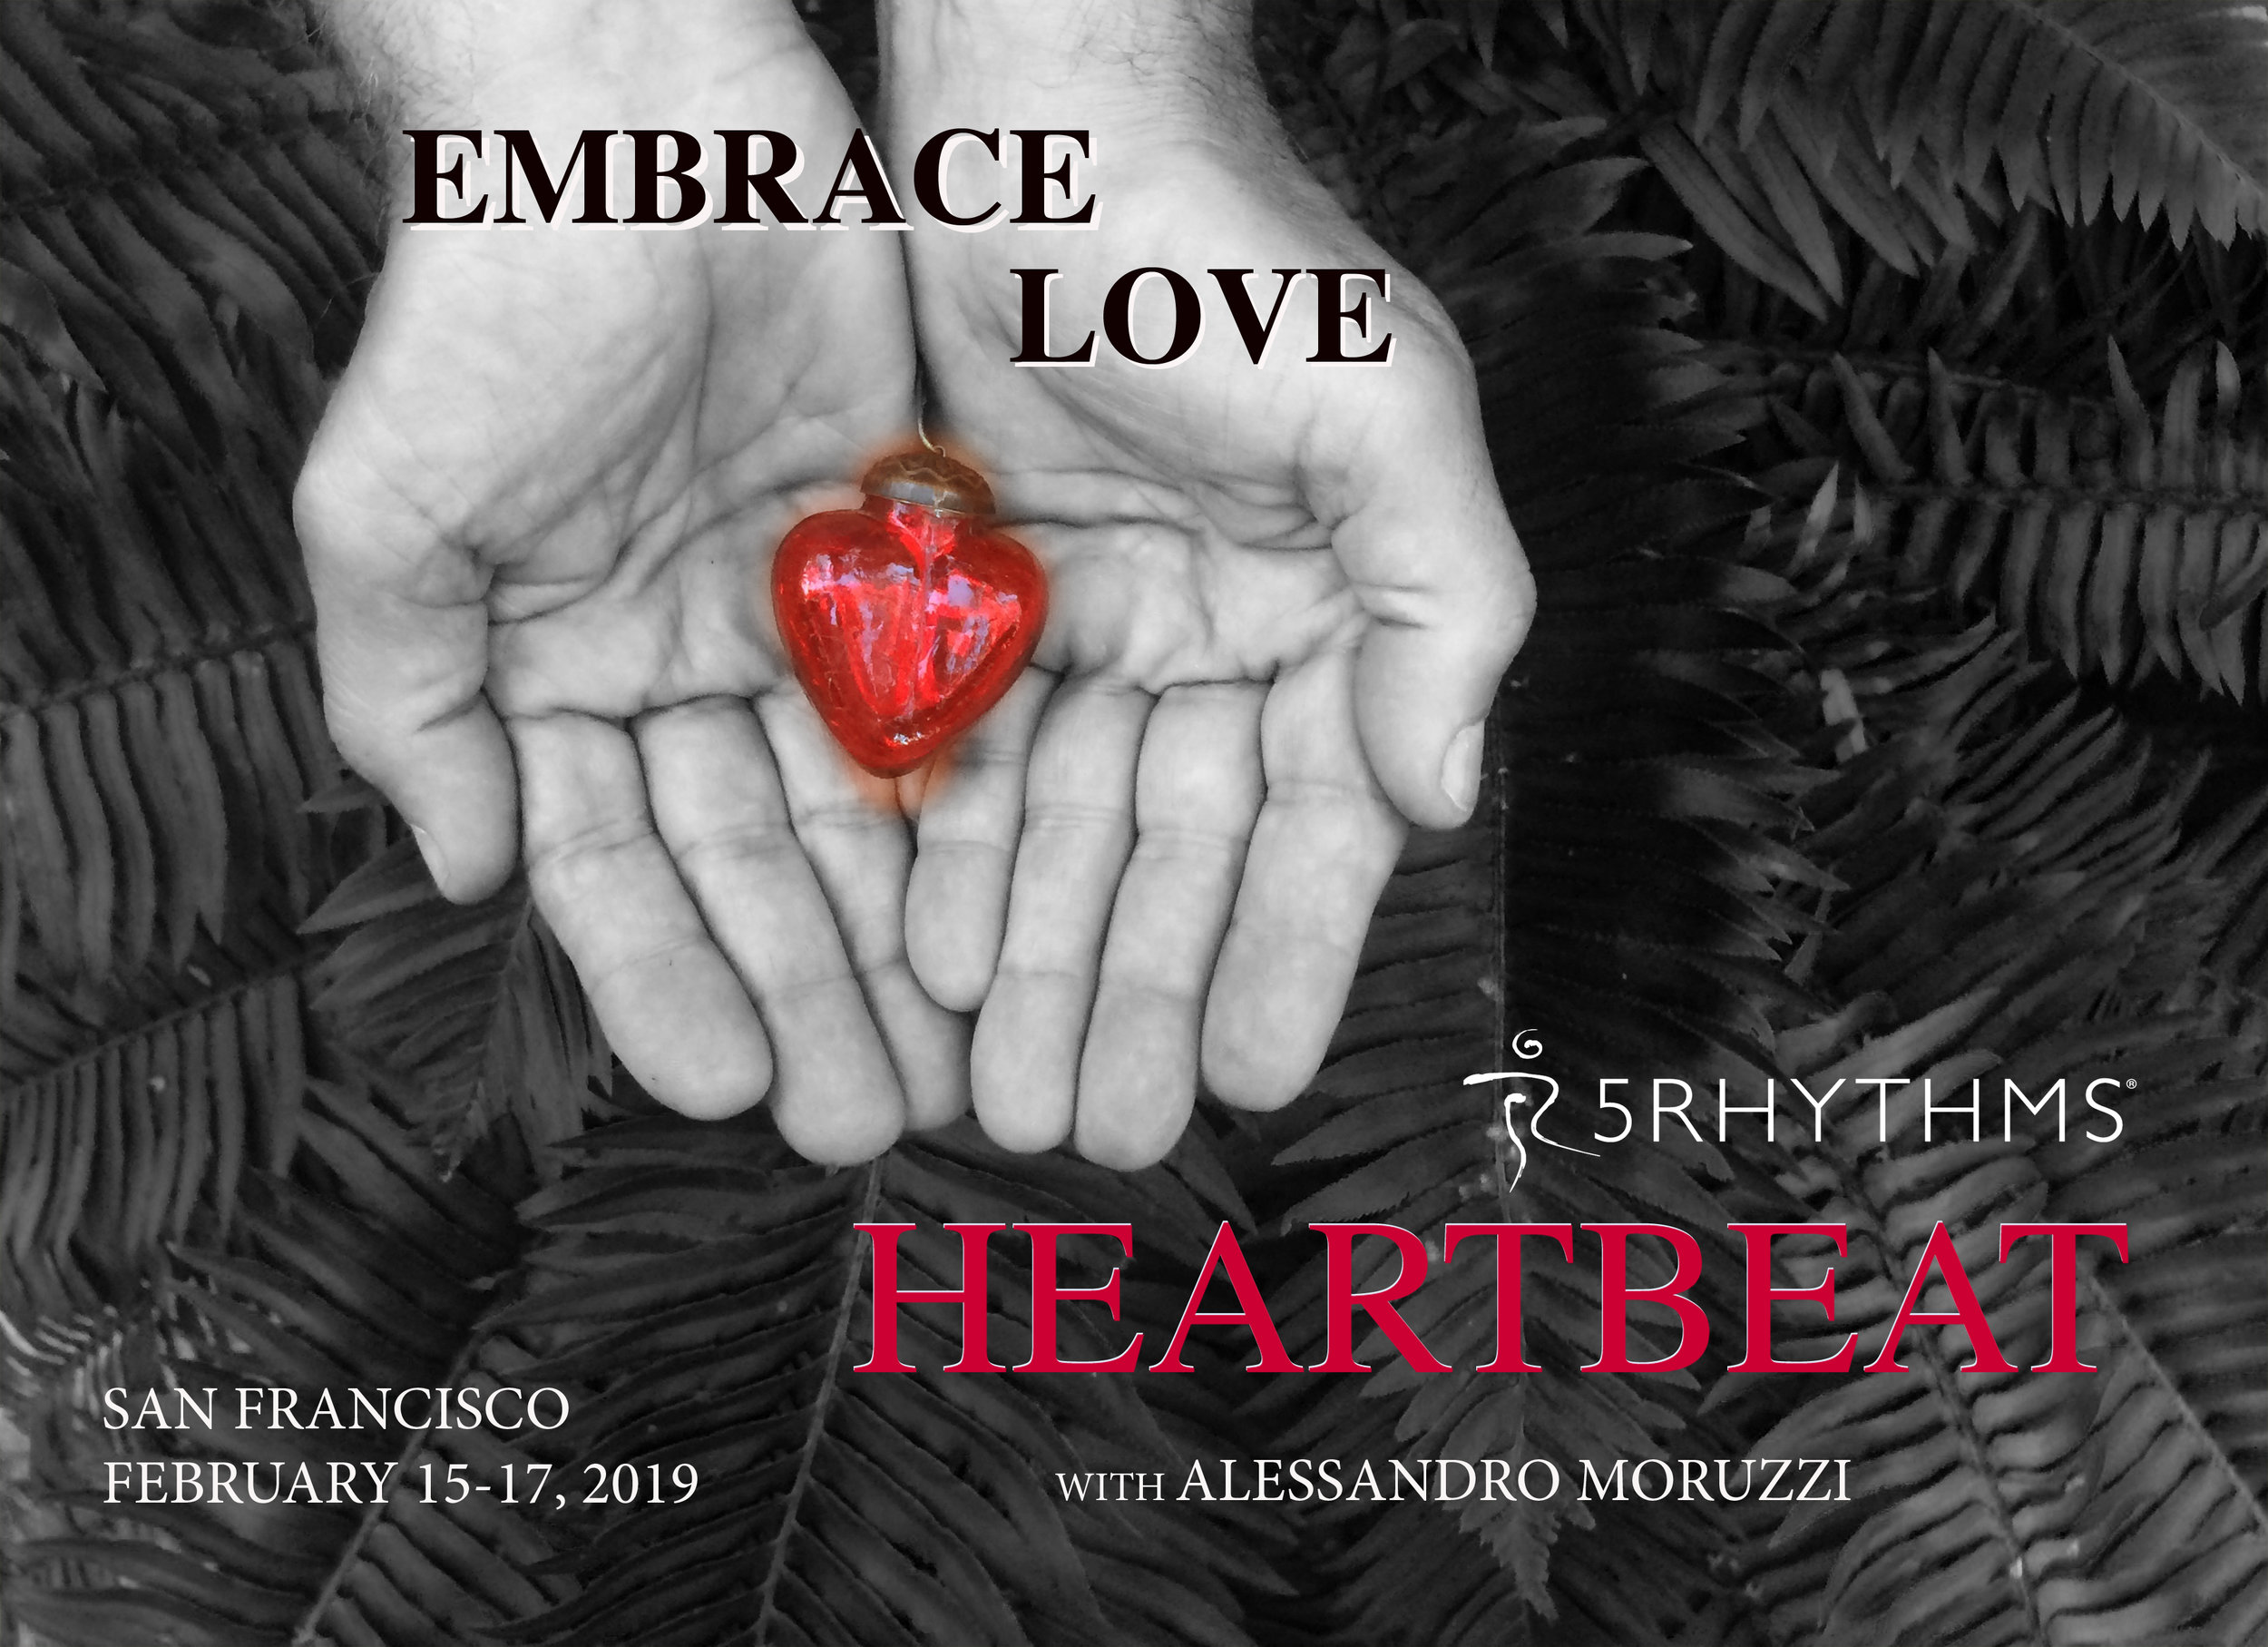 EMBRACE LOVE Feb 2019 postcard image.jpg